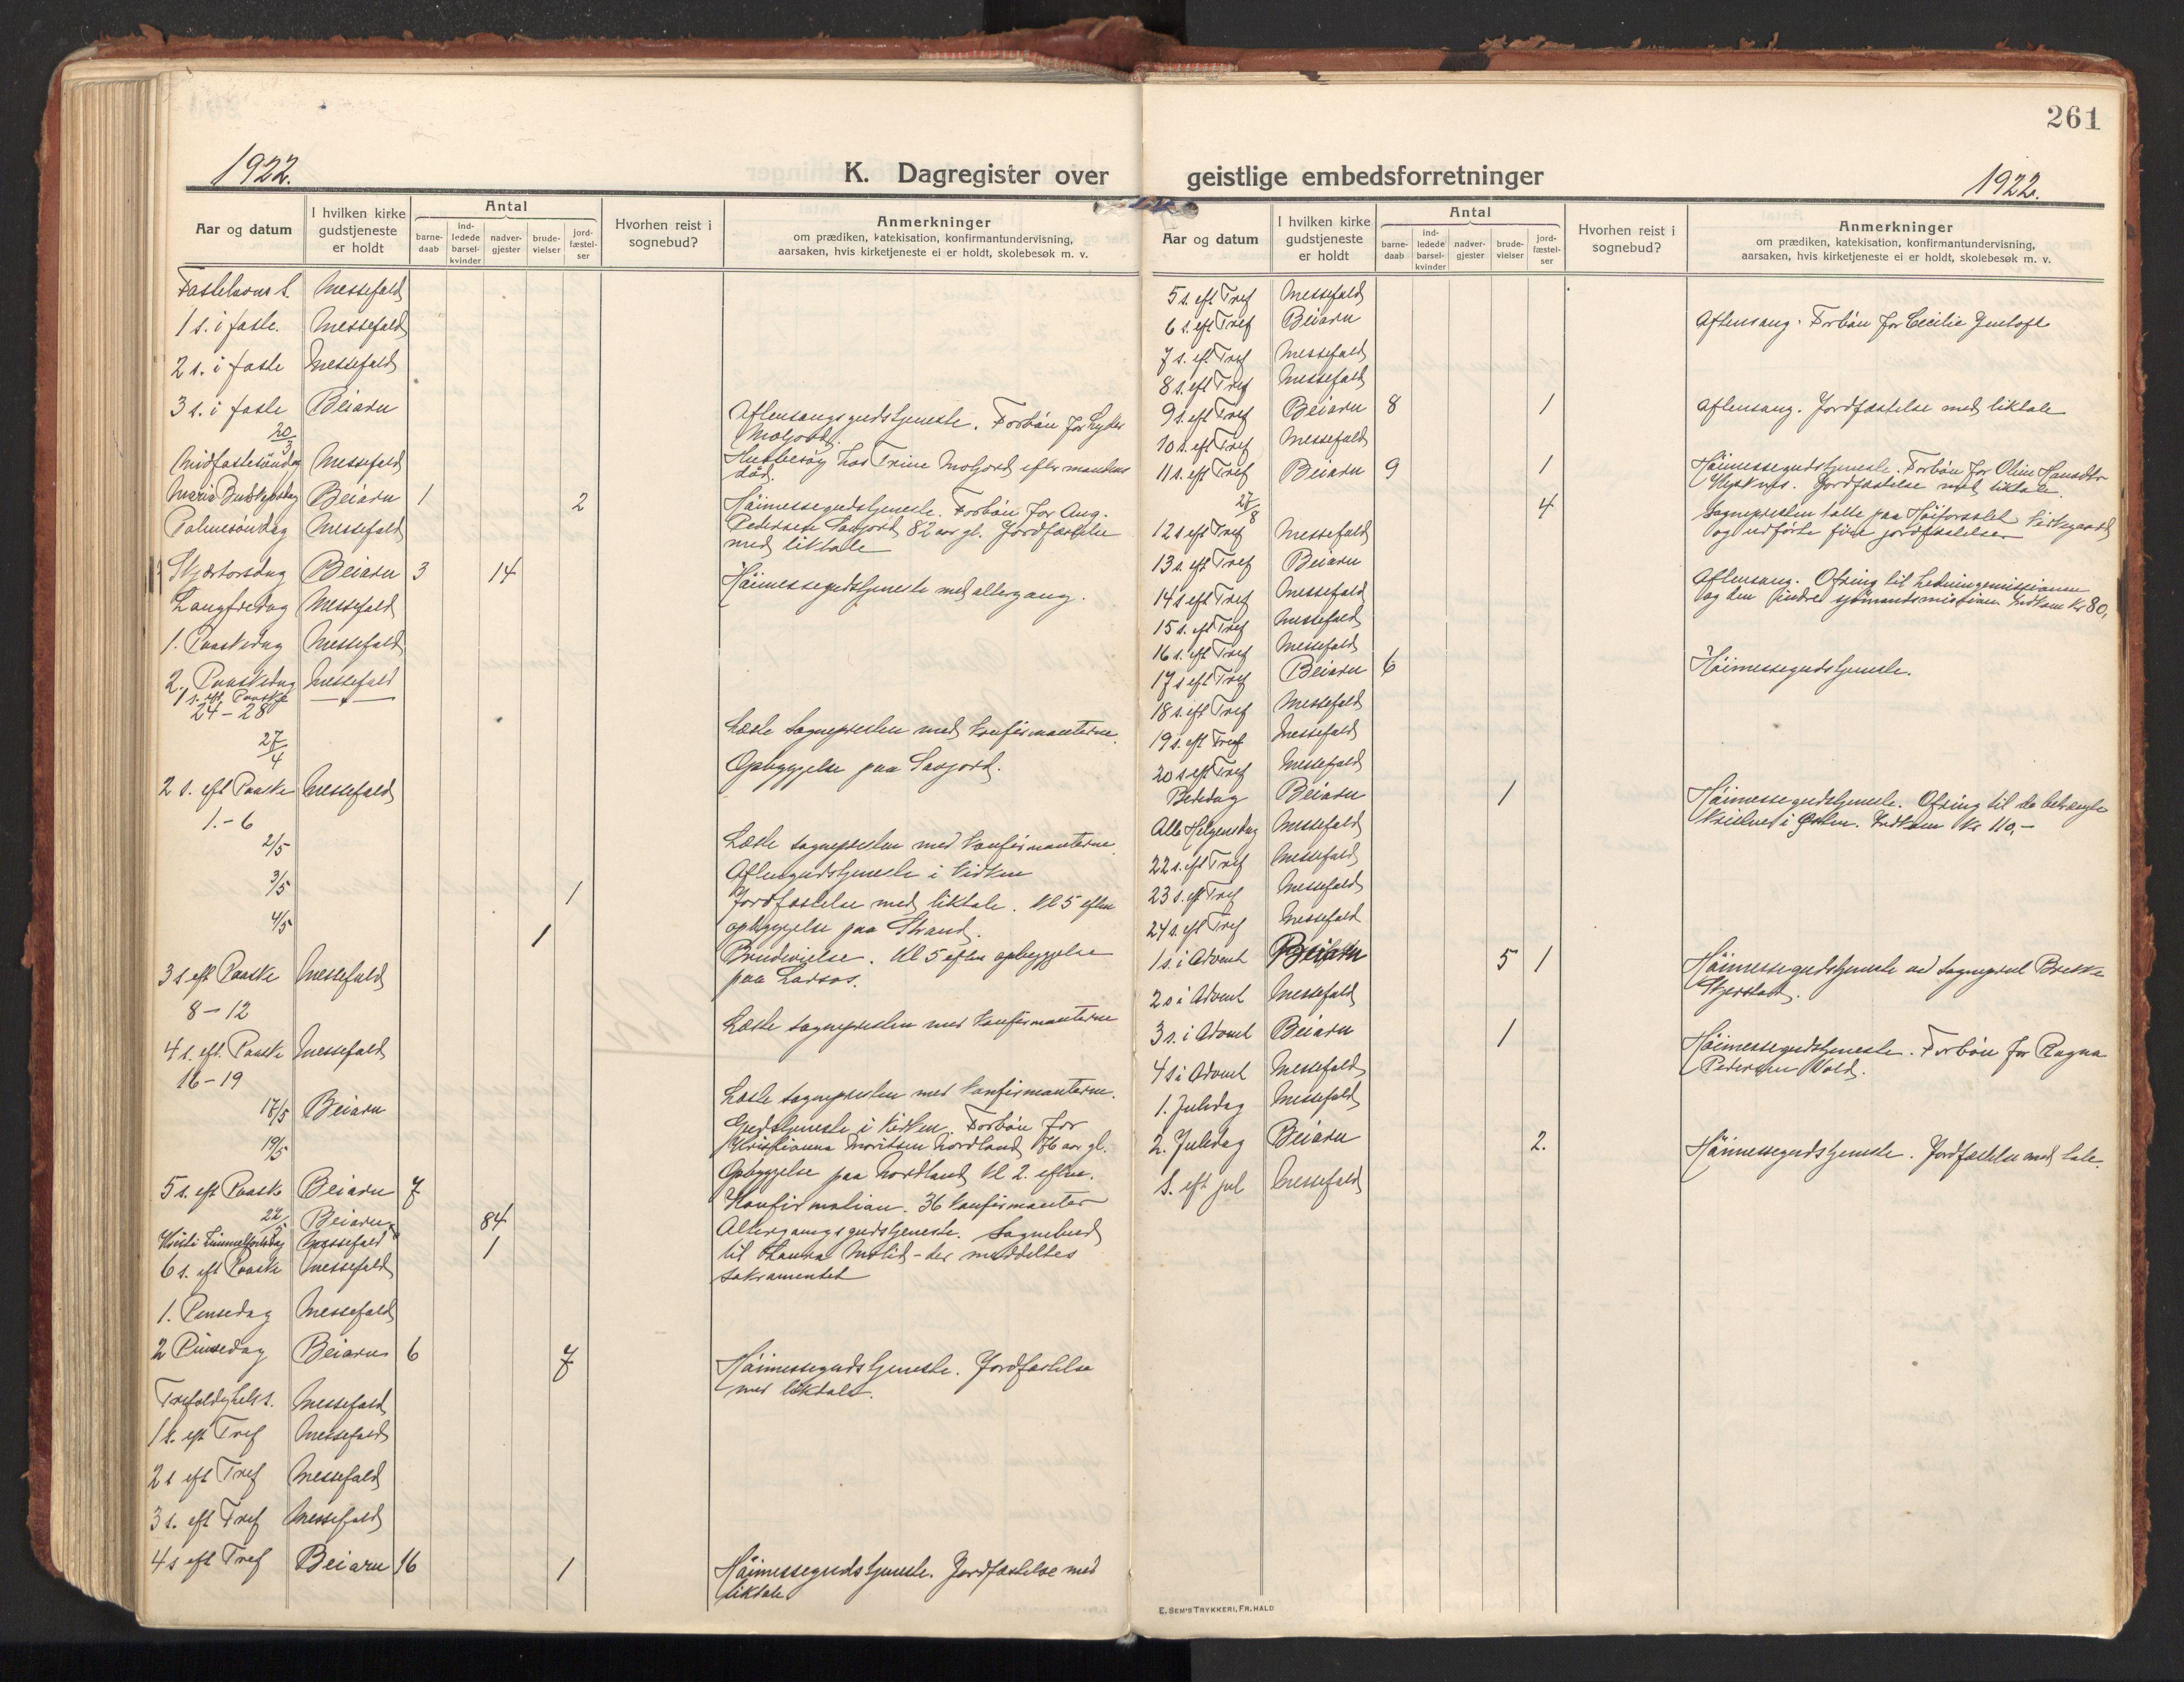 SAT, Ministerialprotokoller, klokkerbøker og fødselsregistre - Nordland, 846/L0650: Ministerialbok nr. 846A08, 1916-1935, s. 261